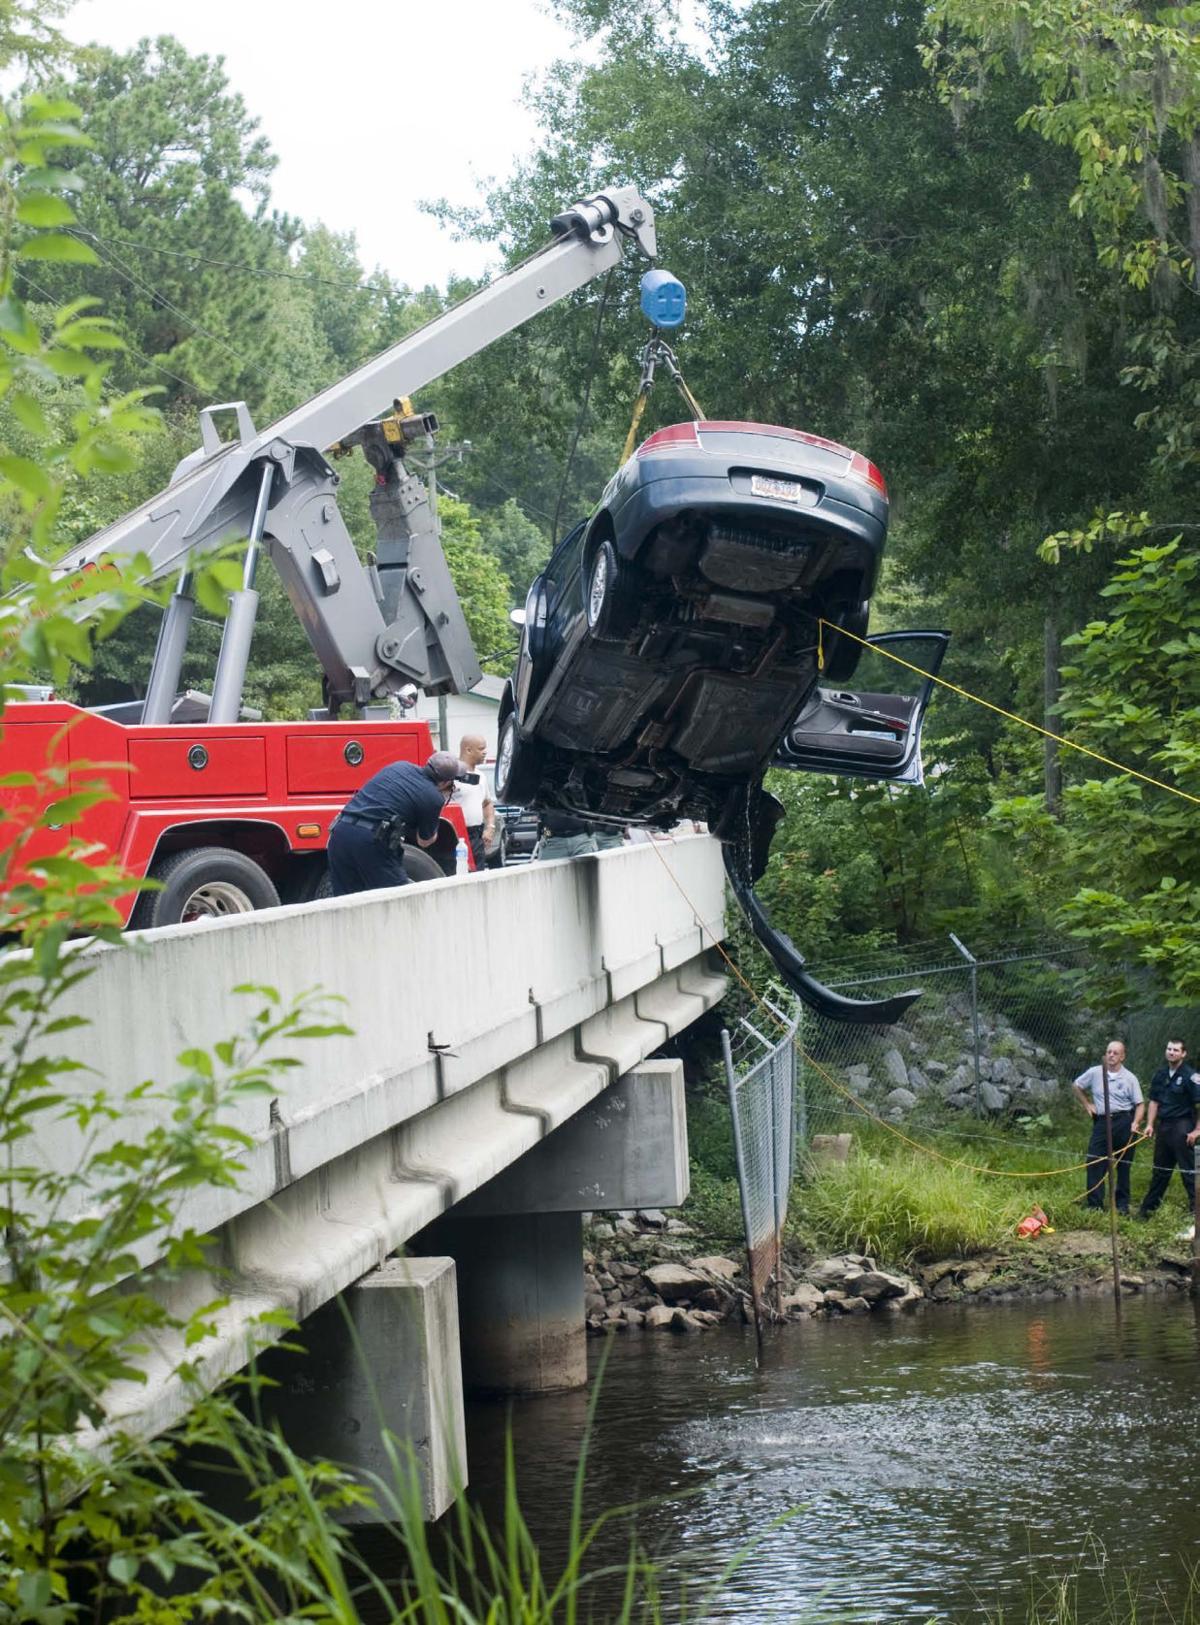 Bodies of 2 children found in car in Edisto River